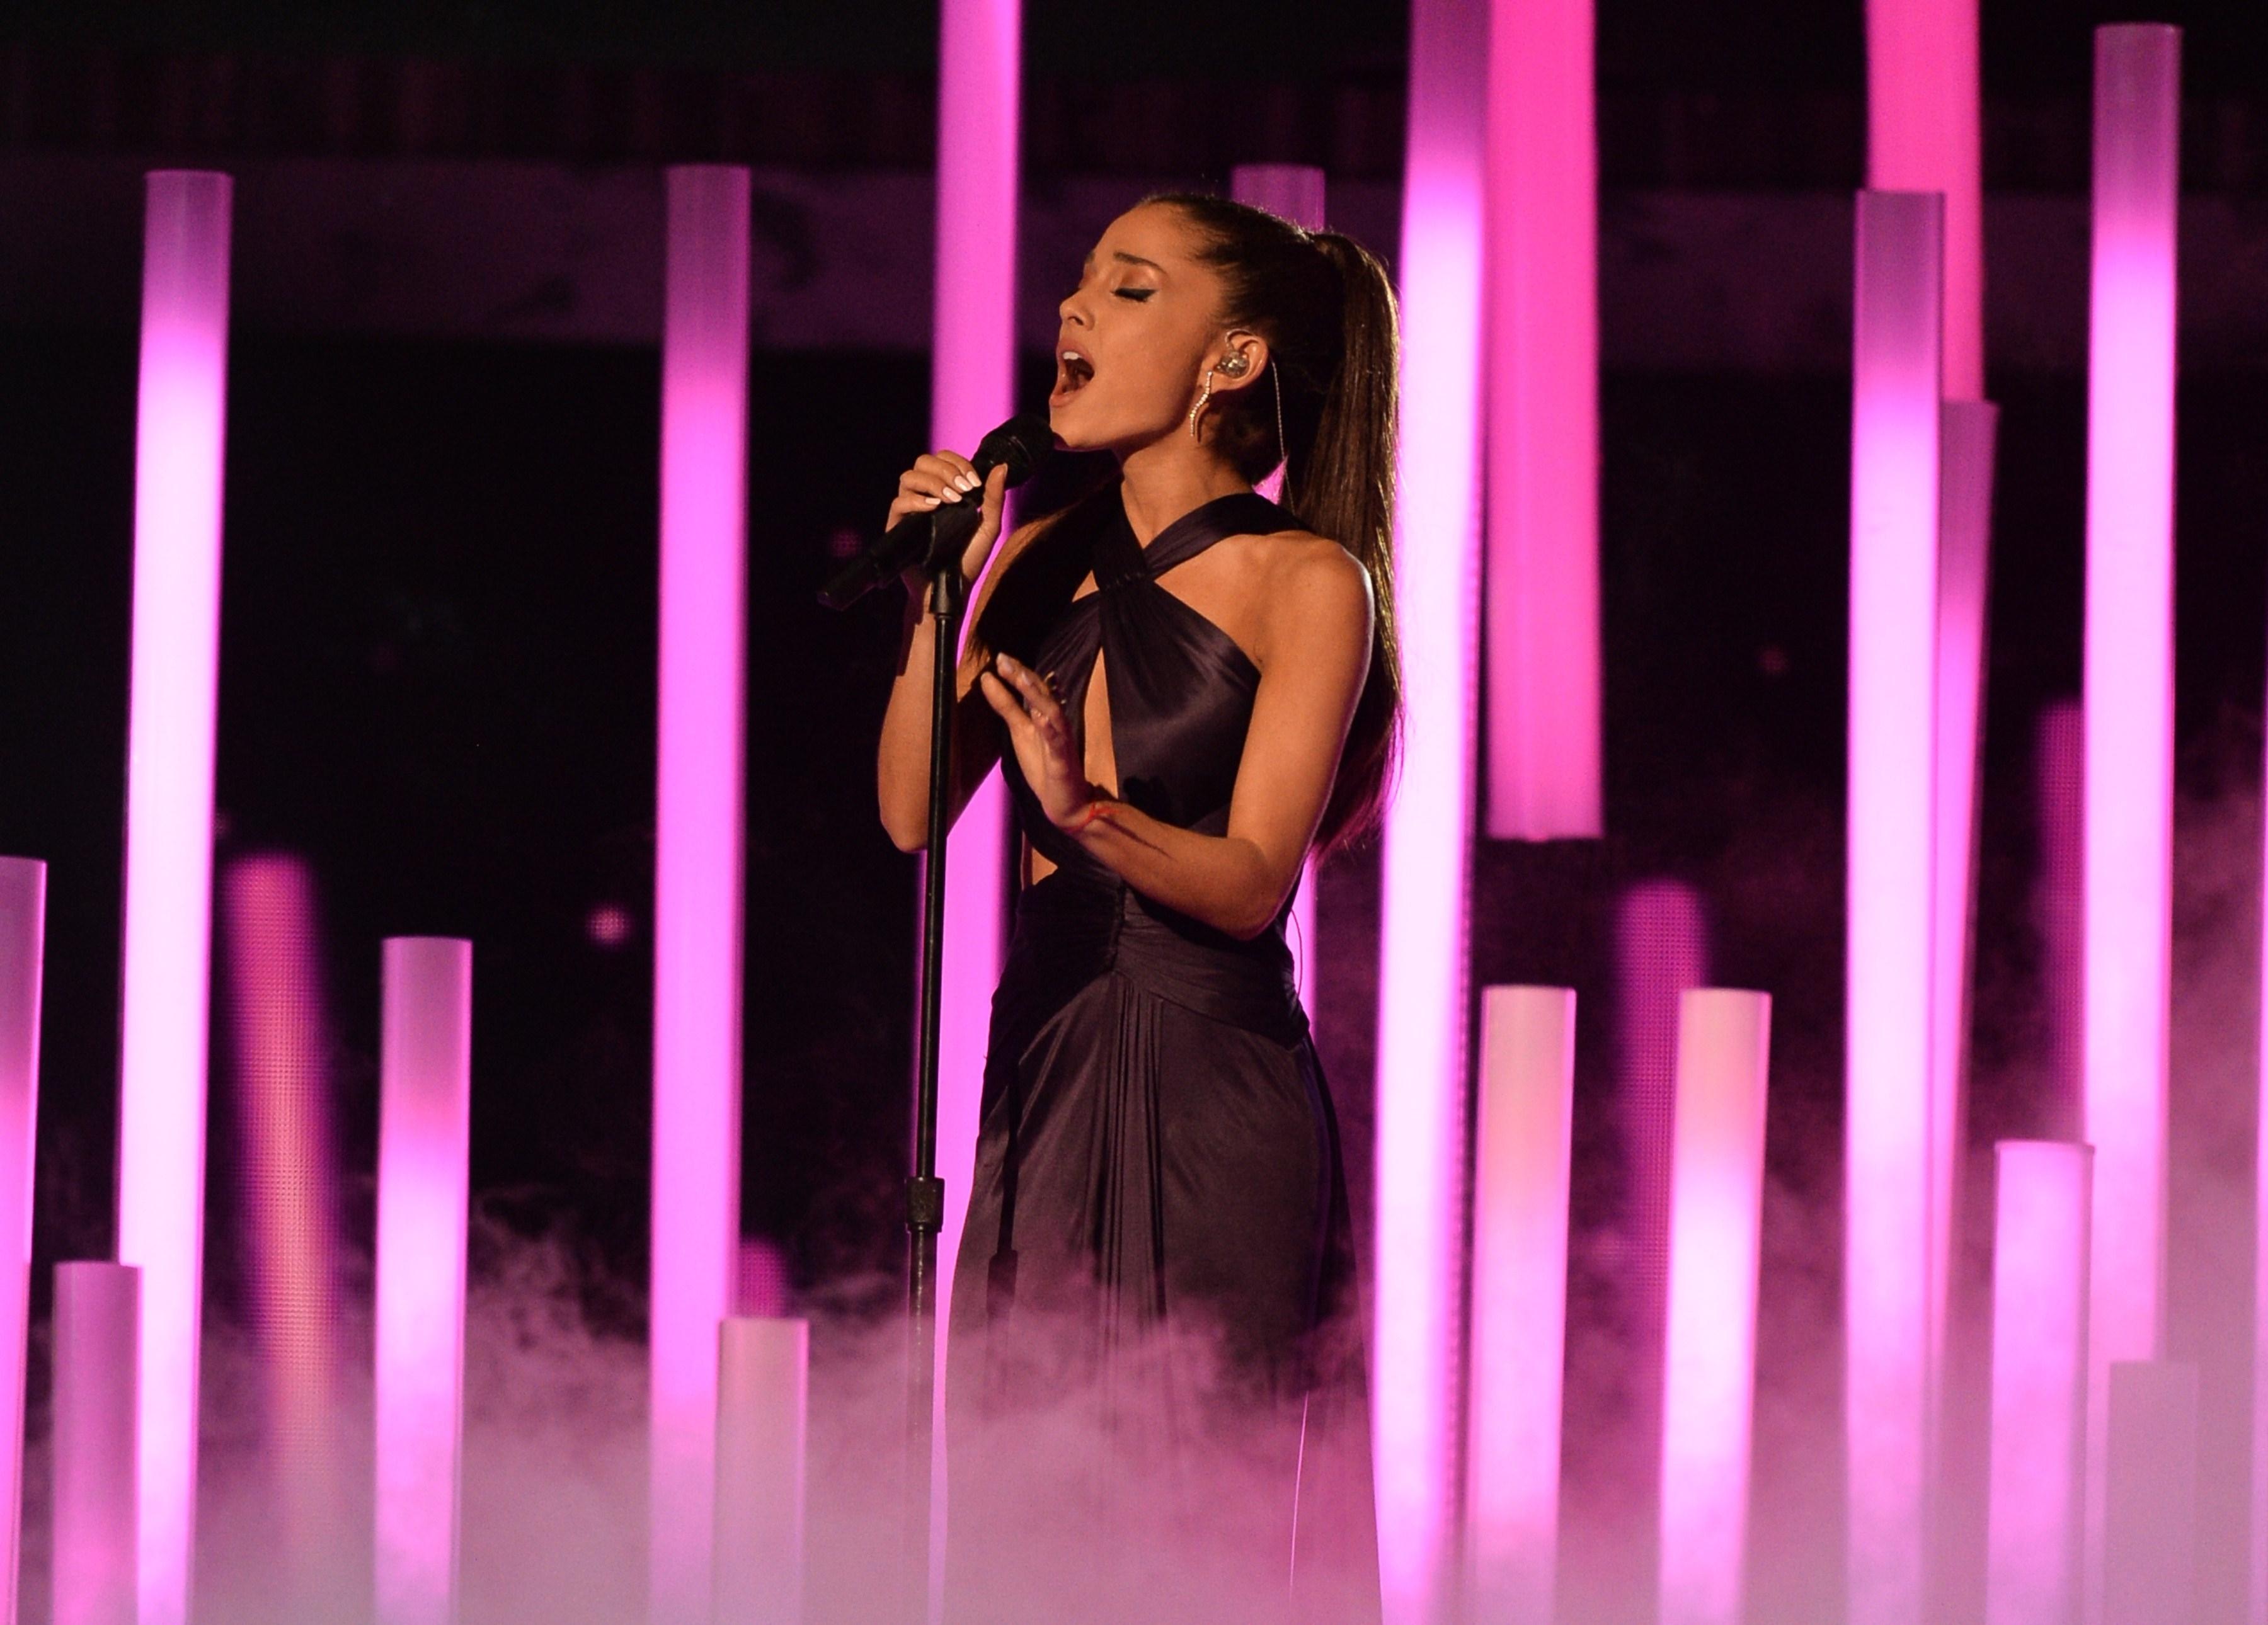 Ariana Grande Music Video Or YA Dystopian Adaptation — Can